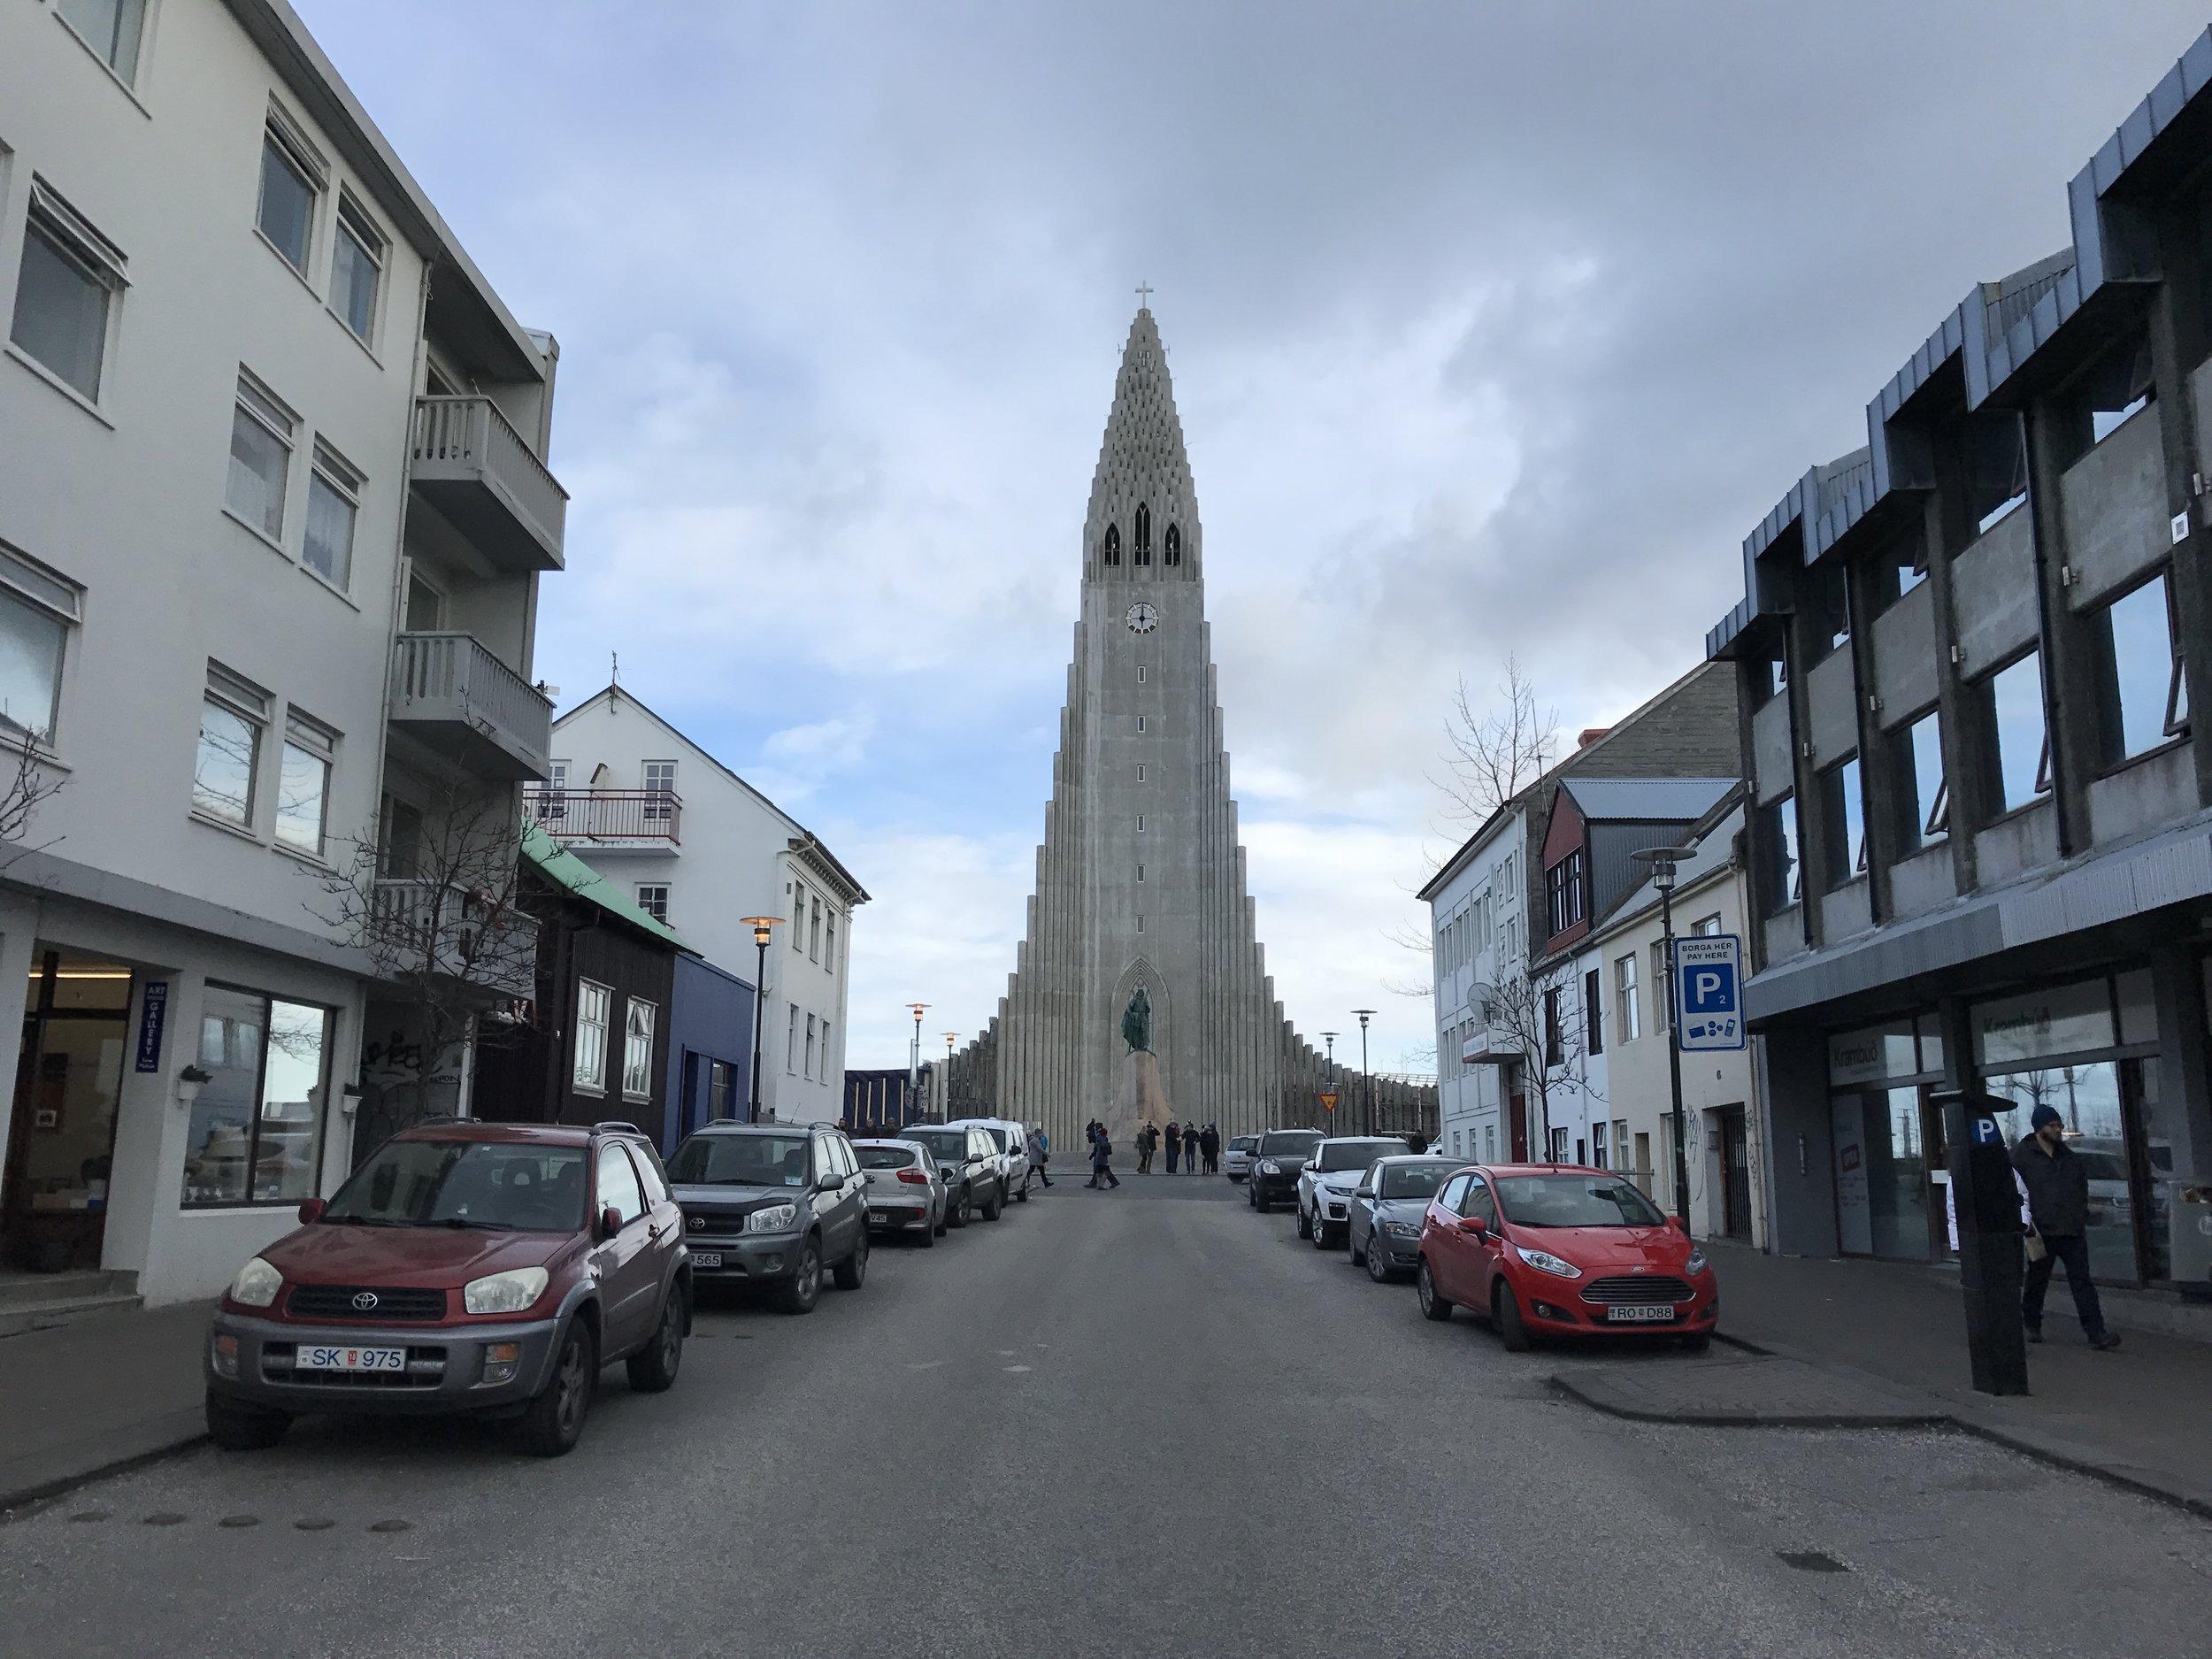 Hallgrimskirkja-Reykjavik-Iceland